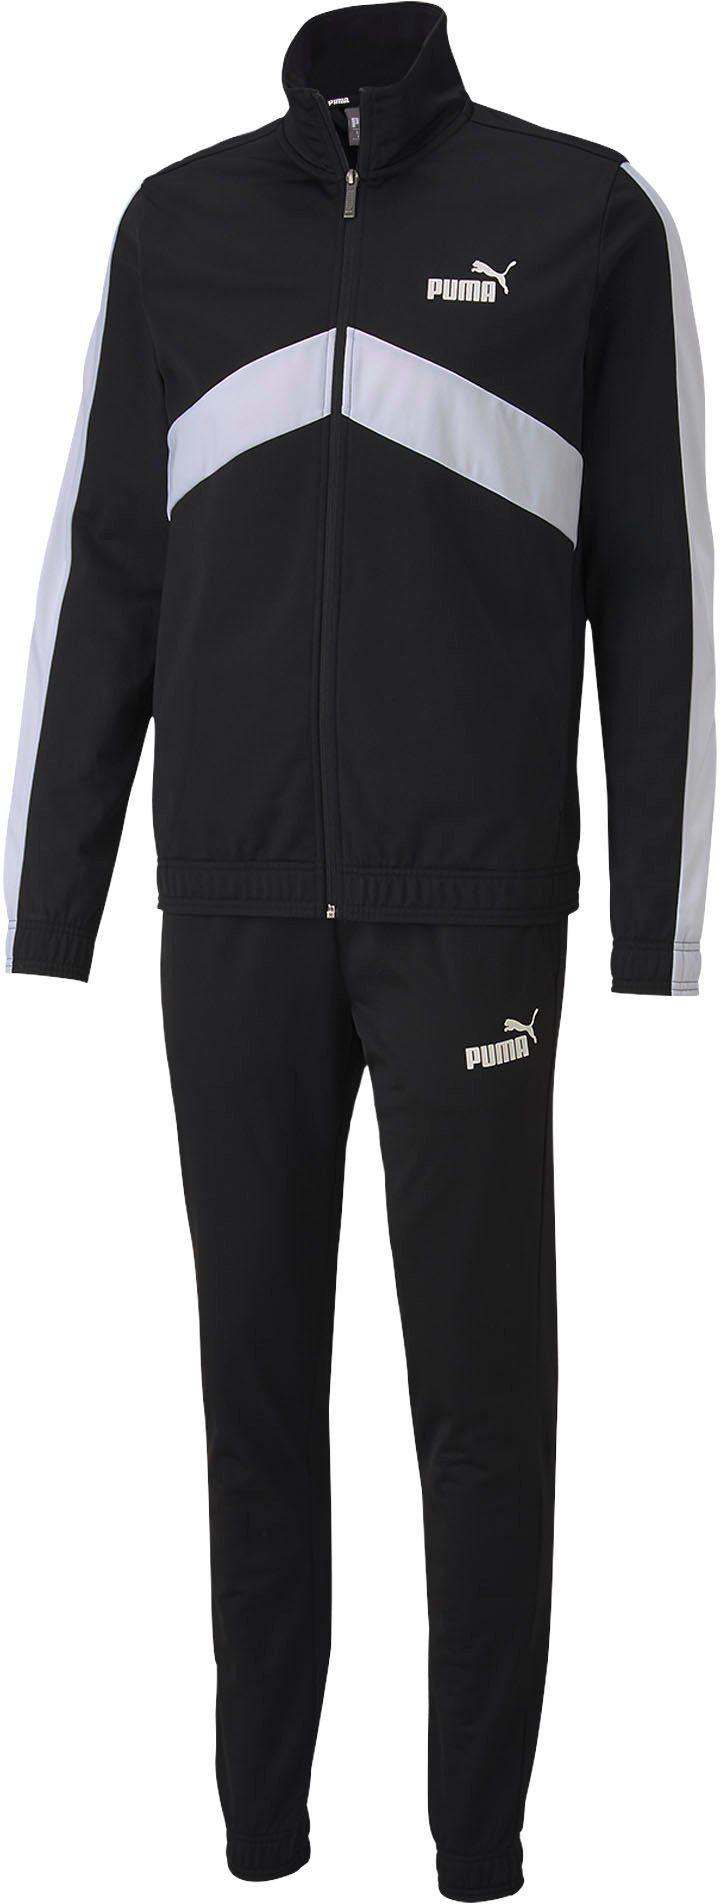 PUMA Trainingsanzug »Classic Tricot Suit« (Set, 2 tlg